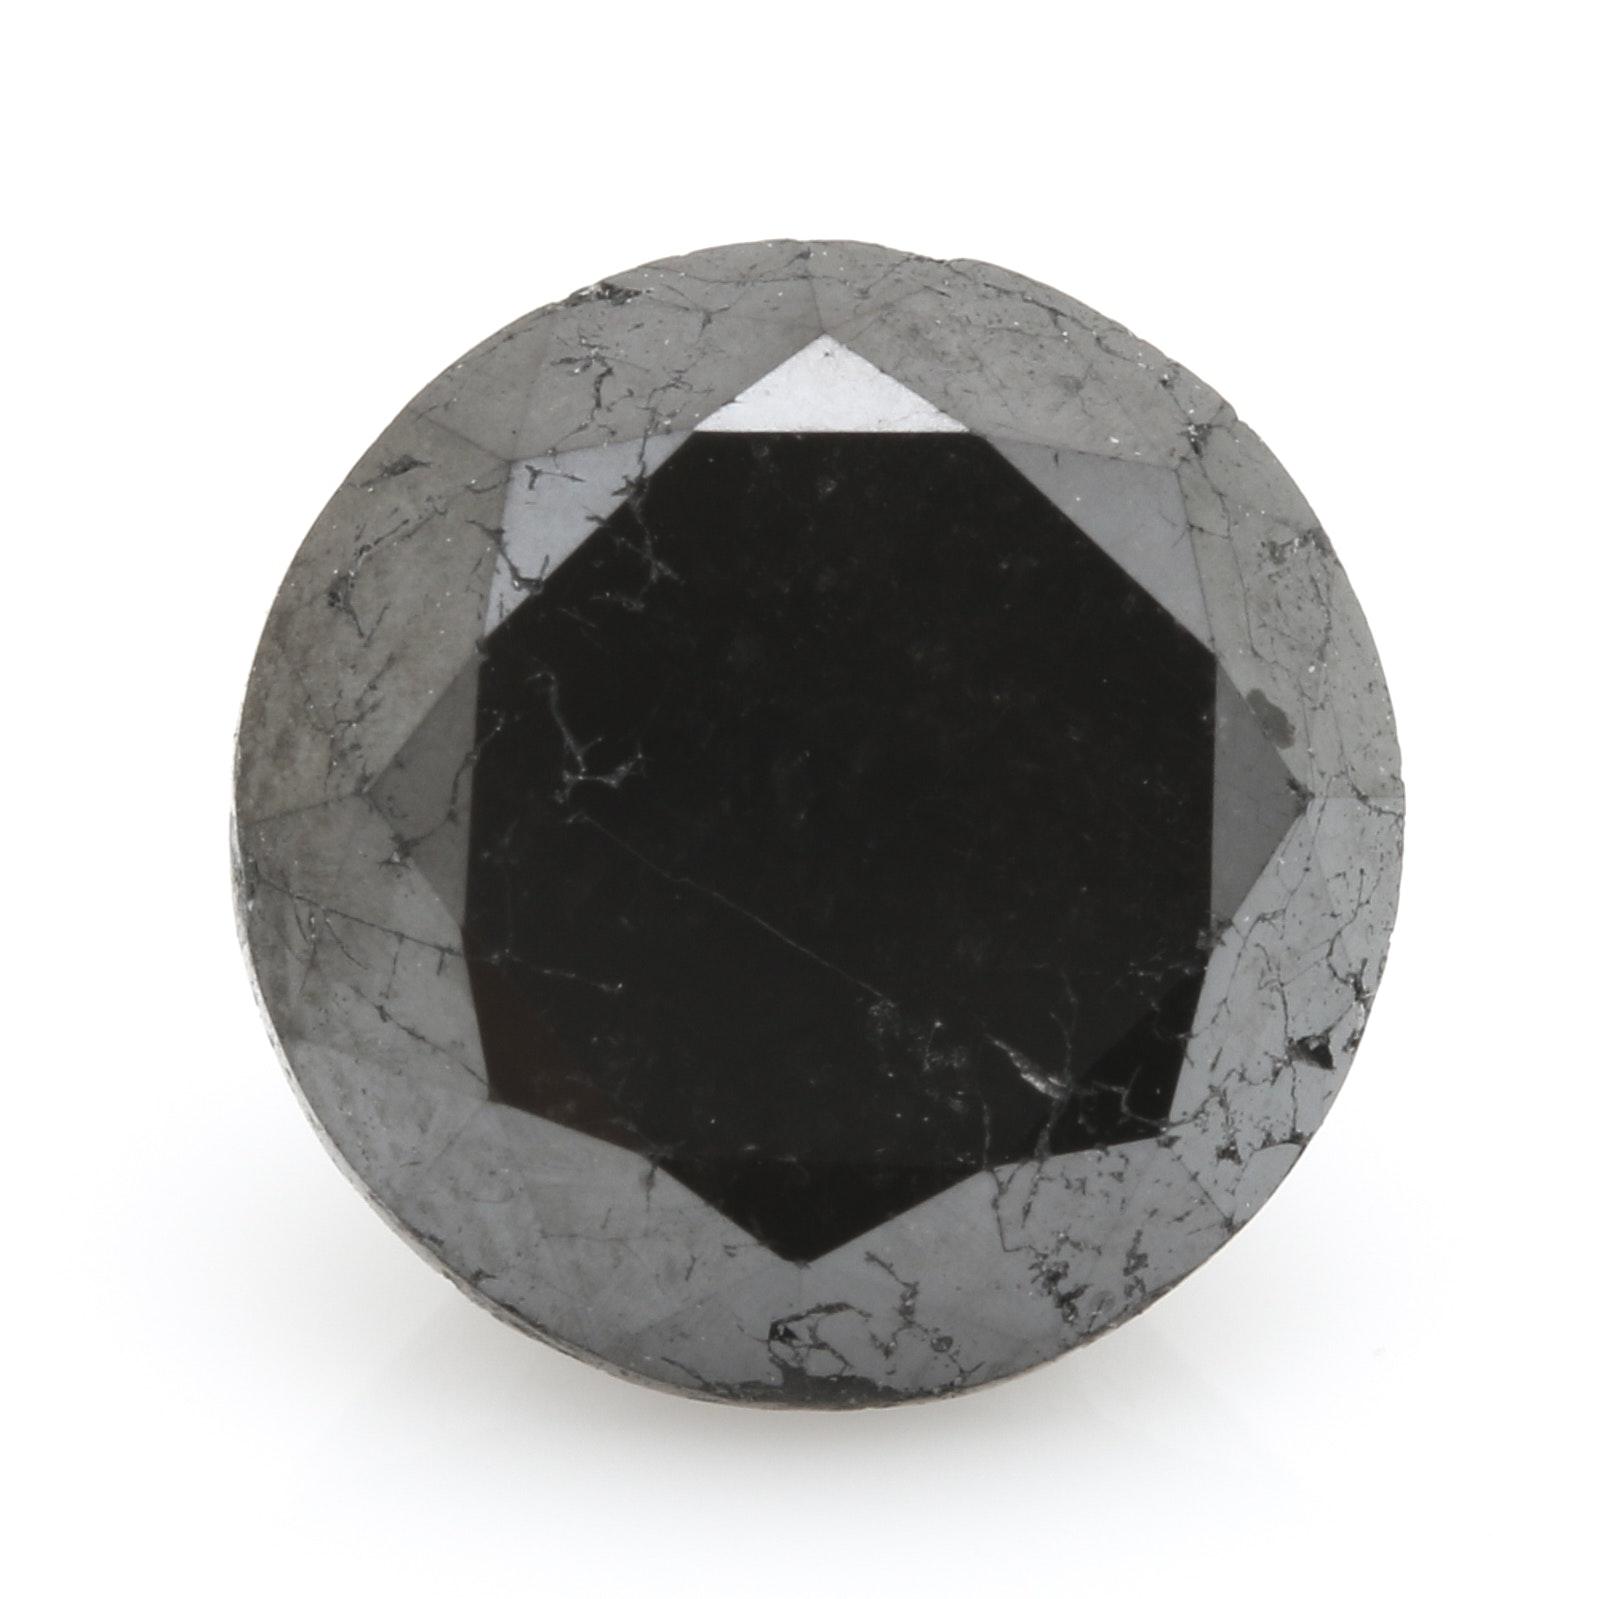 3.94 CT Loose Black Diamond